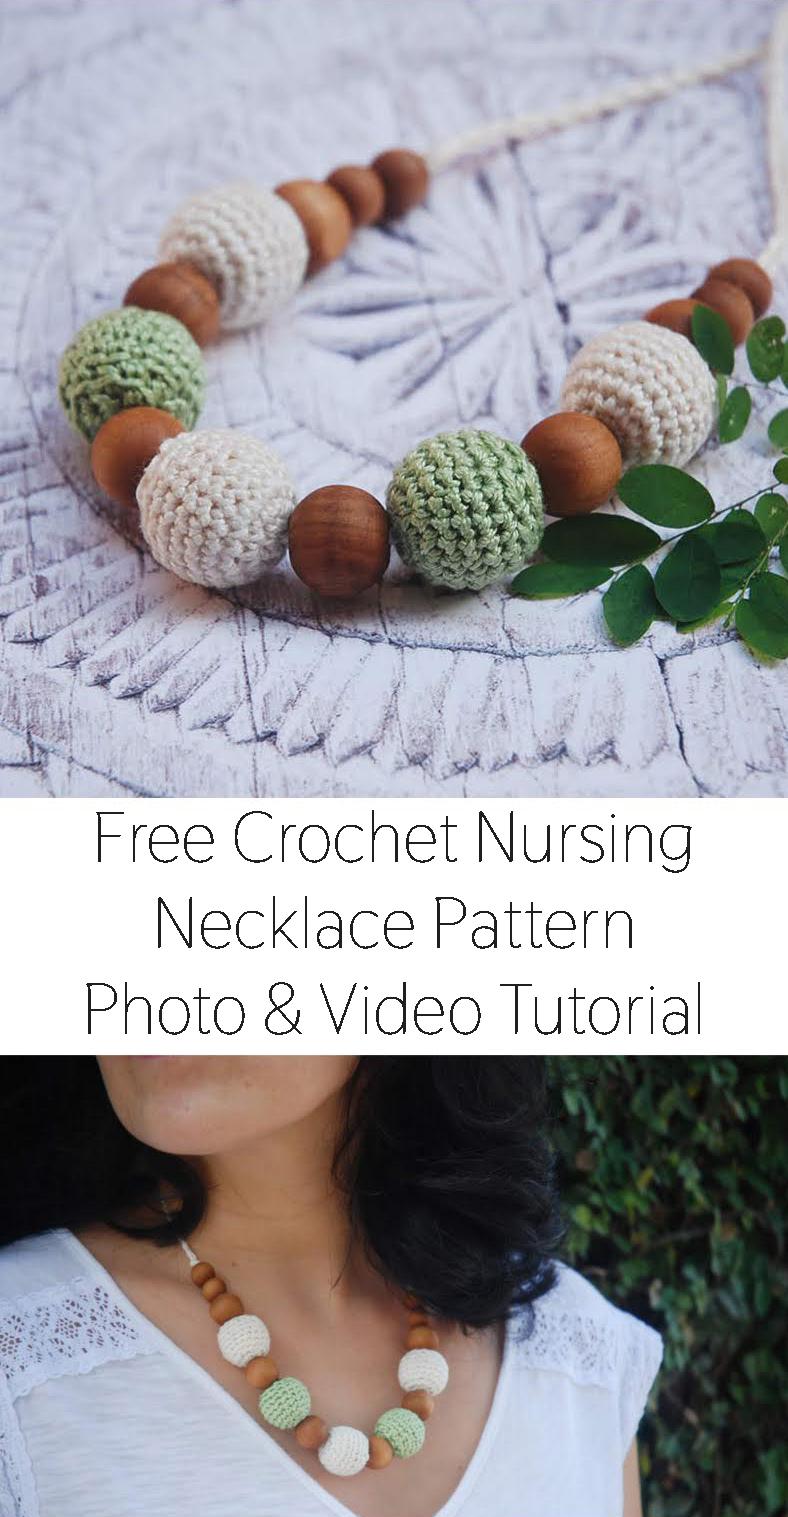 Crochet Nursing Necklace Pattern - Crochet Conscious - Moara Crochet